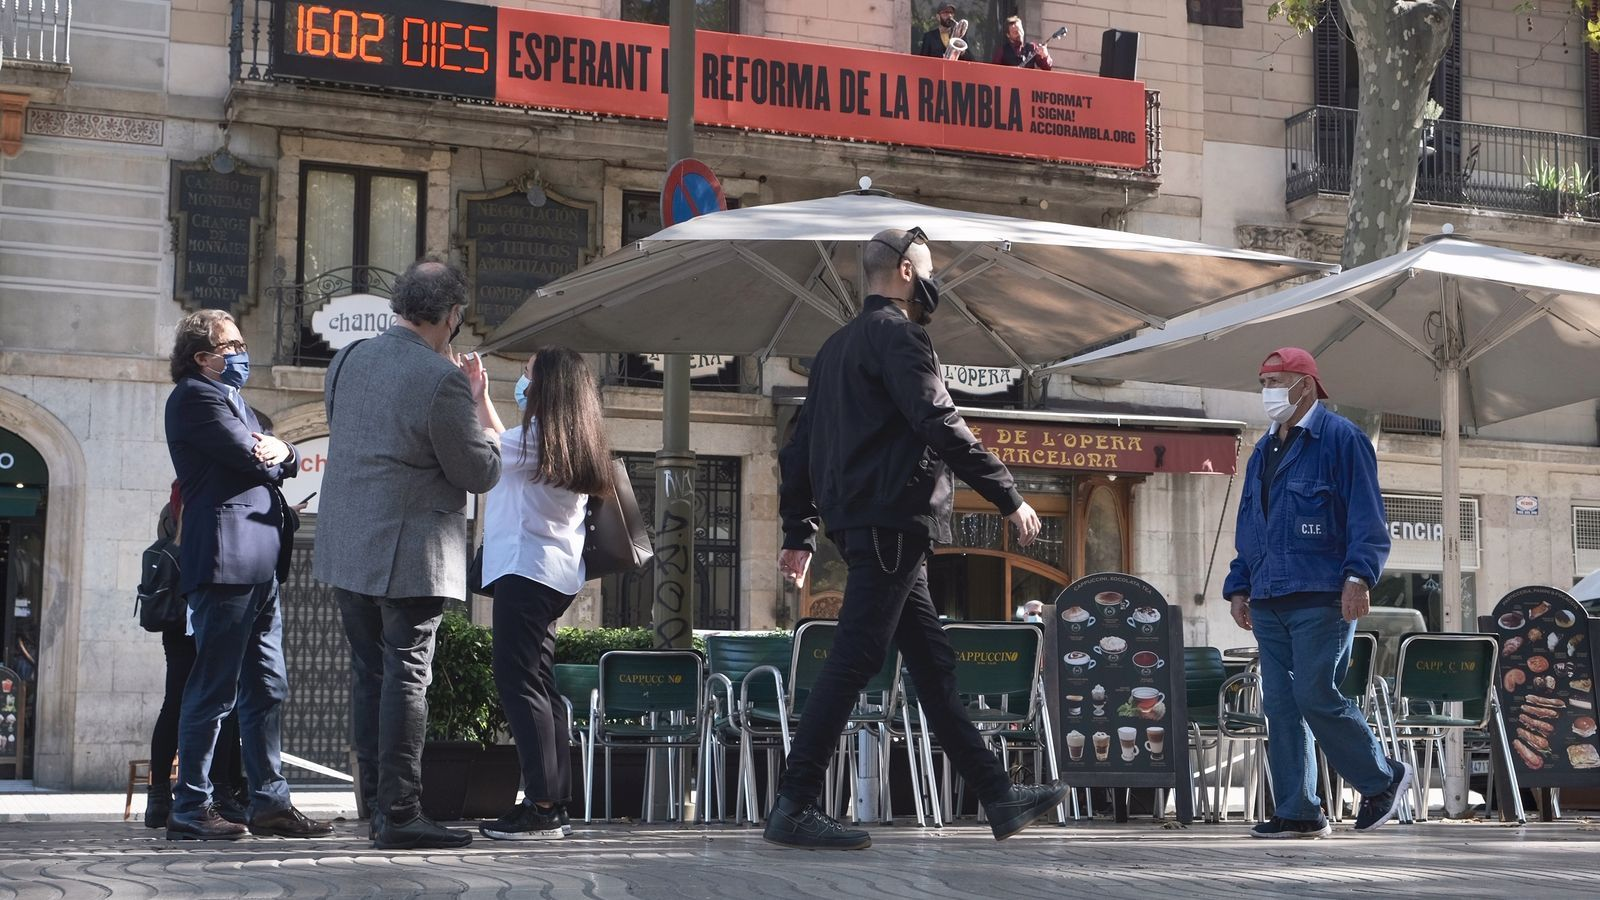 La Rambla de Barcelona compta els dies de retard de la seva reforma